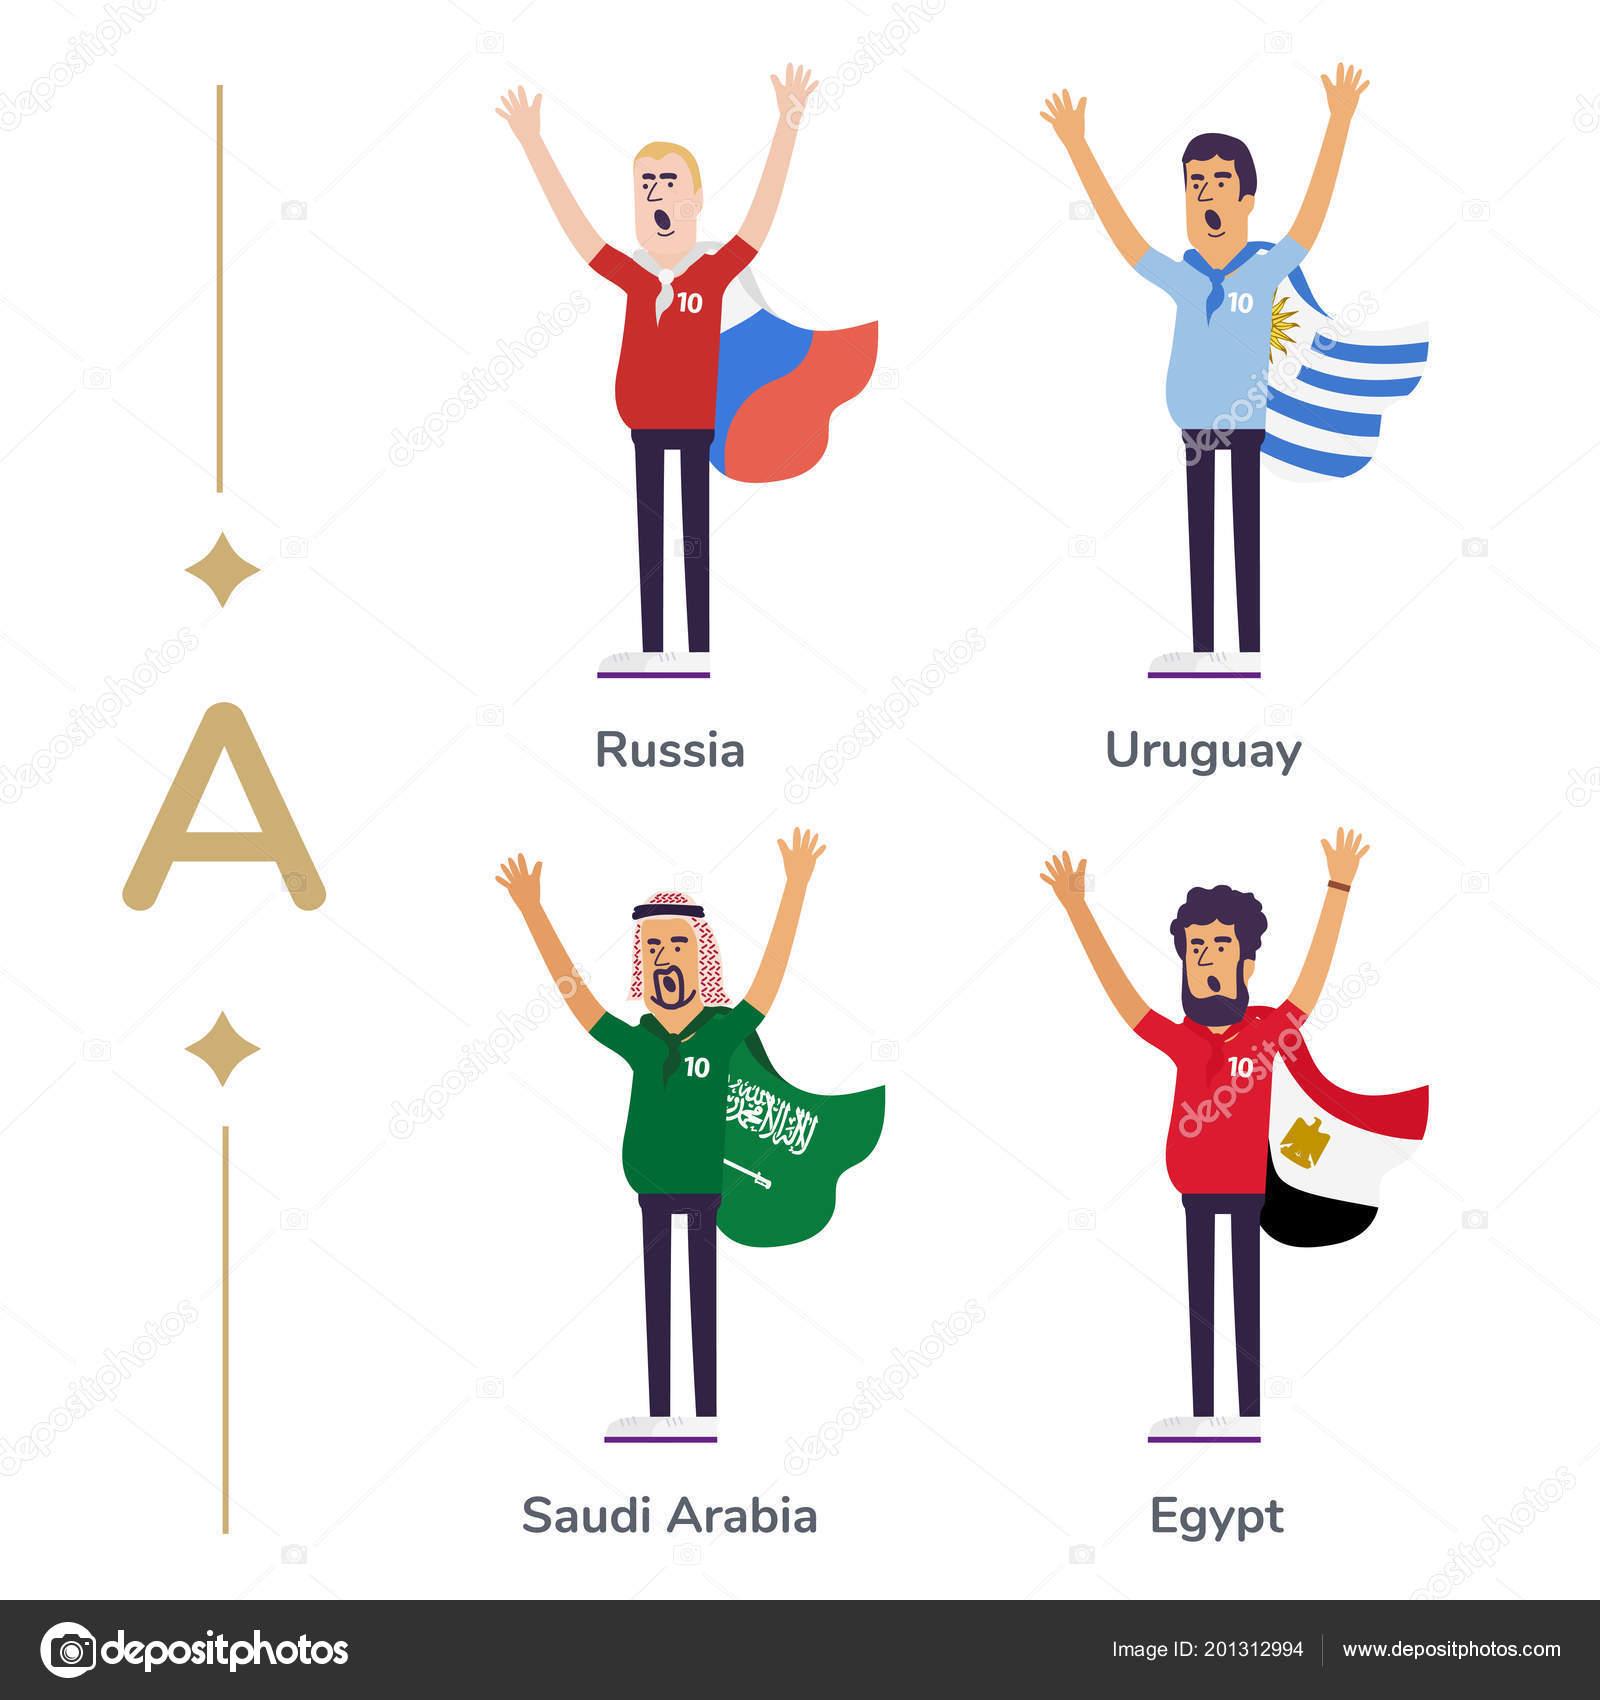 randki z Arabią Saudyjską como se dice randki i espanol